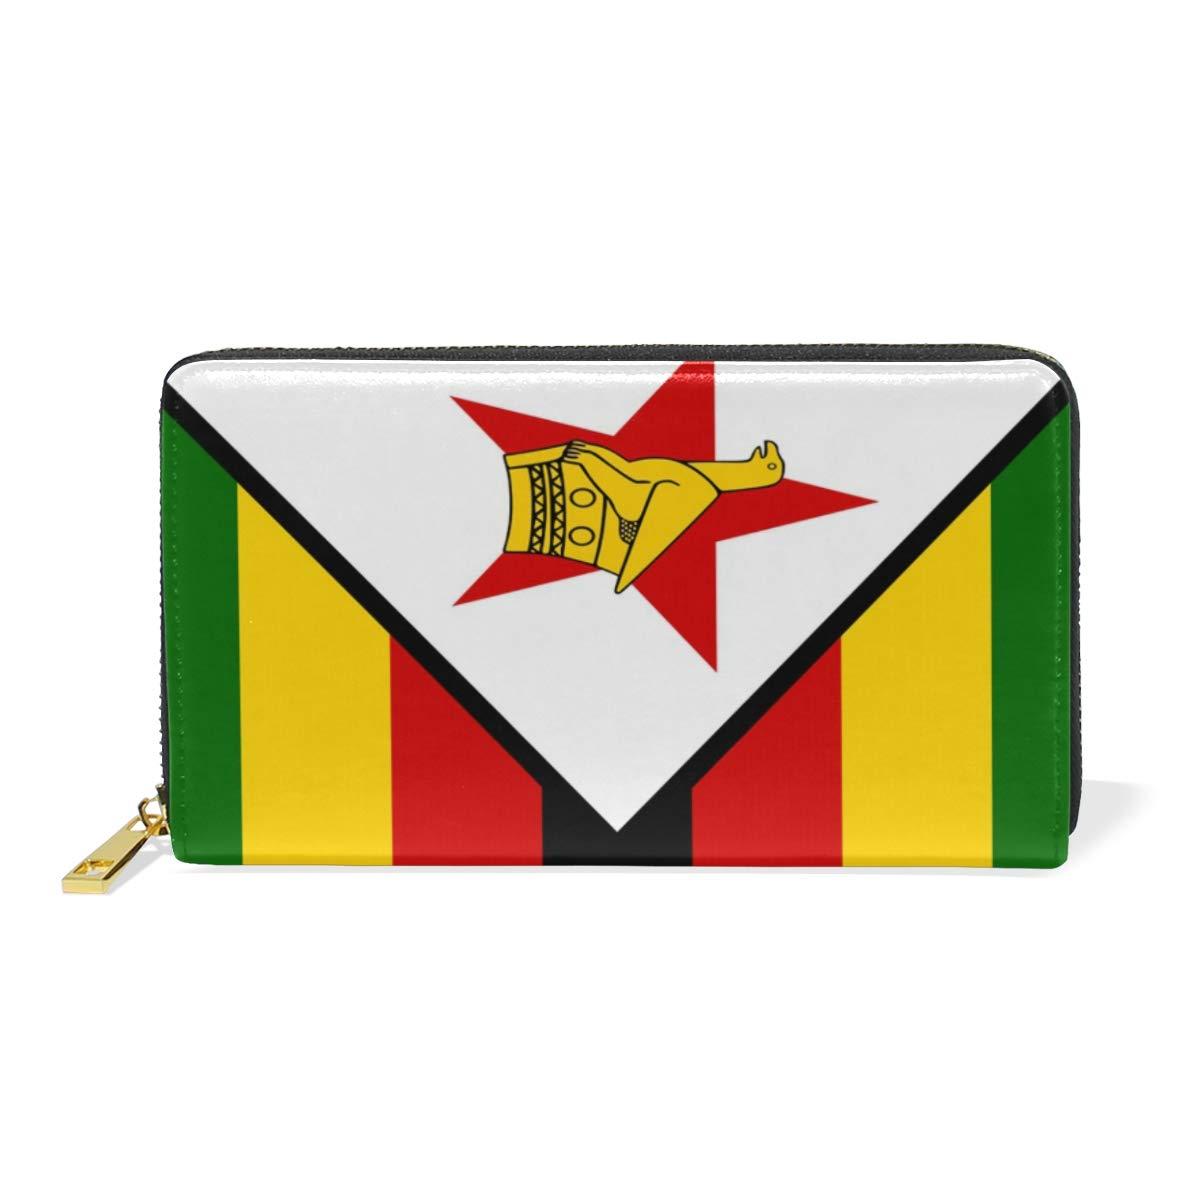 Slim Minimalist Leather Wallets For Women Men Zimbabwe Flag